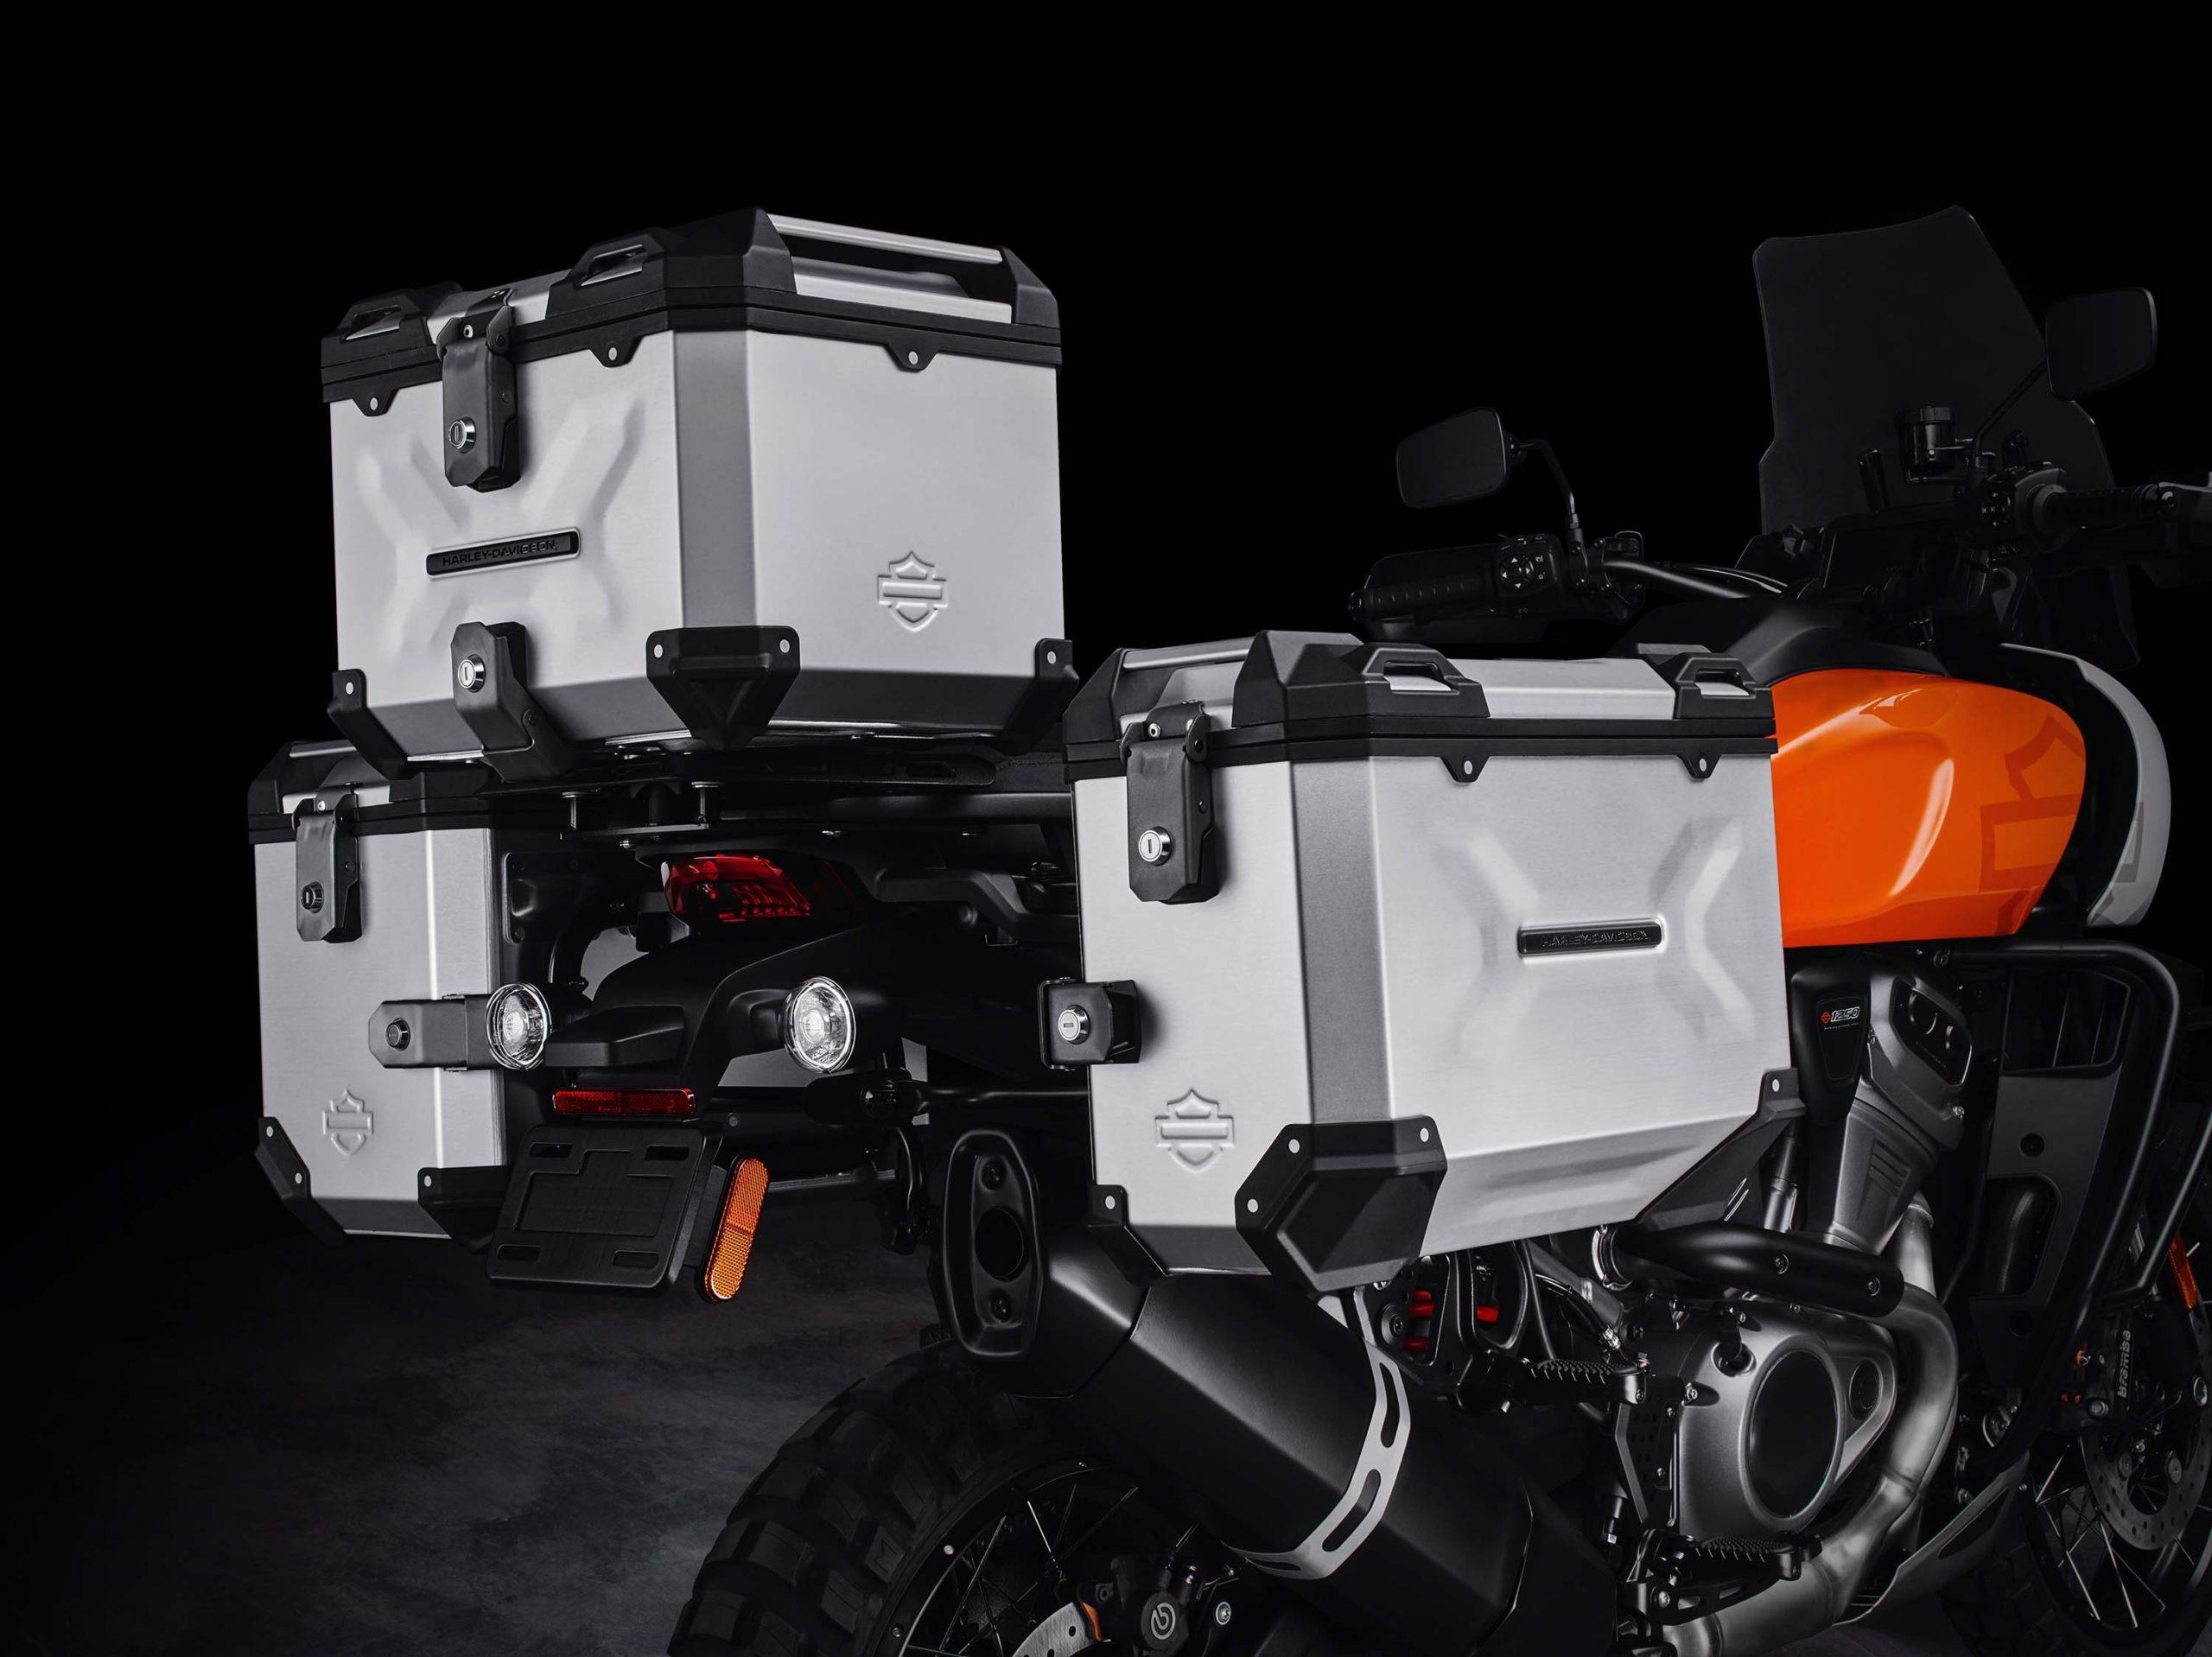 thùng cho Harley-Davidson-Pan-America-Xefun